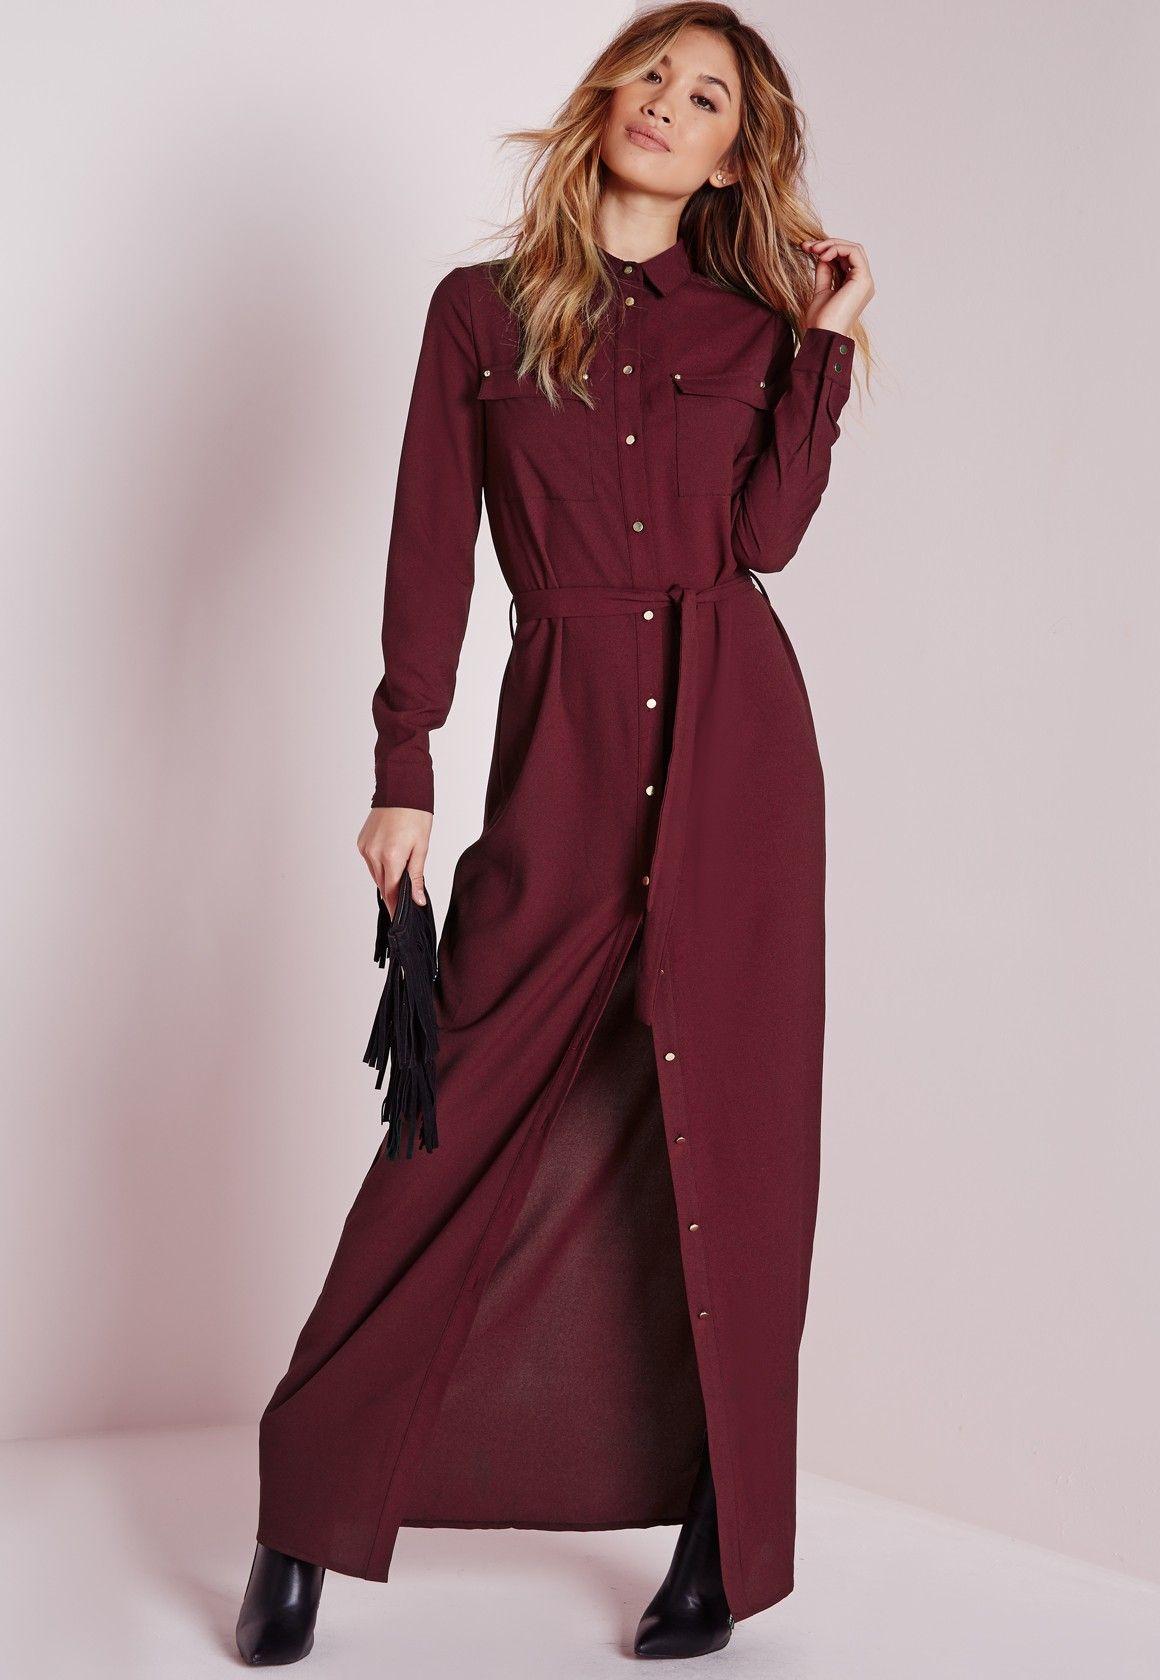 Neutralnova Maxi Dress Womens Maxi Dresses Burgundy Maxi Dress [ 1680 x 1160 Pixel ]